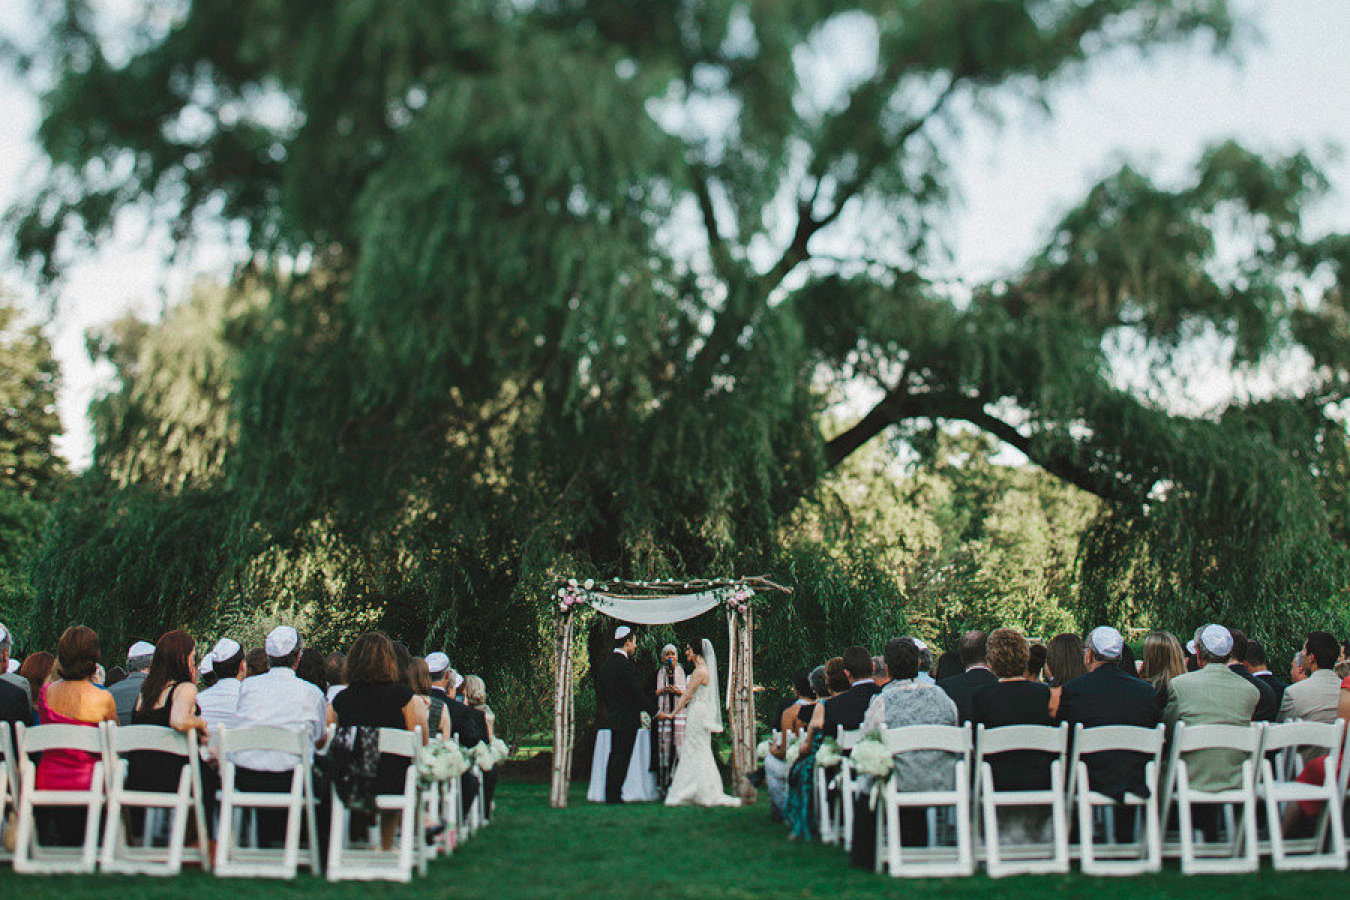 Brooklyn Botanic Garden Wedding from Lev Kuperman